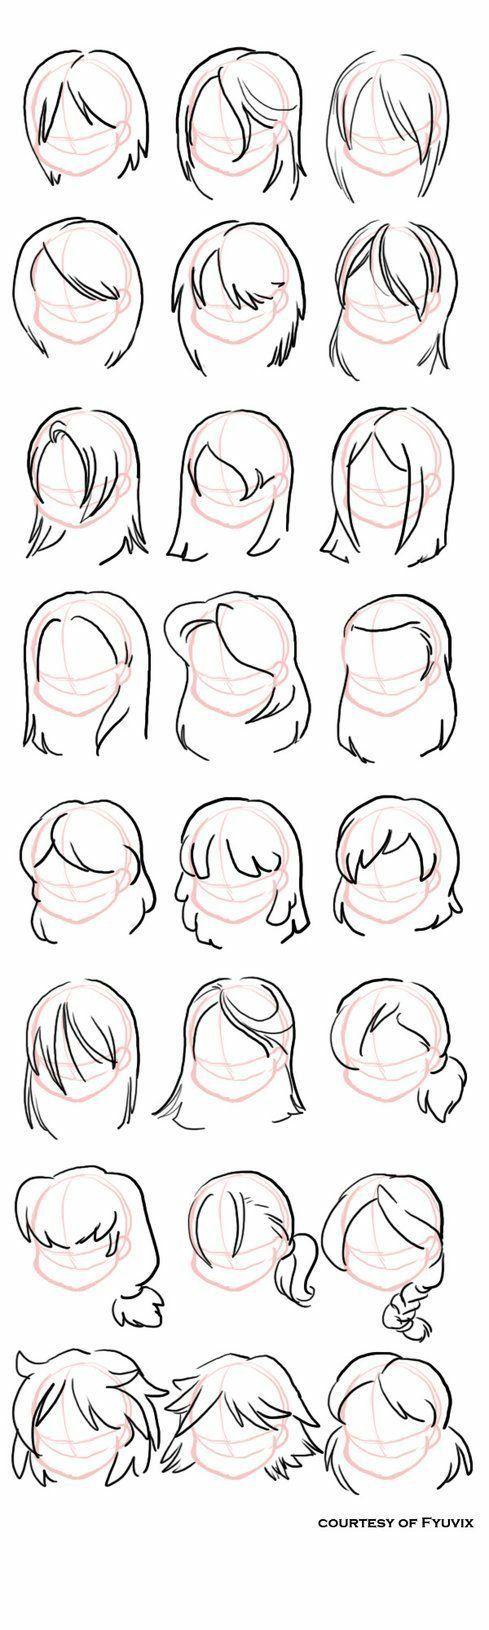 Anime Drawings Sketches, Pencil Art Drawings, Cartoon Drawings, Manga Illustrations, Pencil Sketching, Realistic Drawings, Anime Sketch, Drawing Poses, Drawing Tips